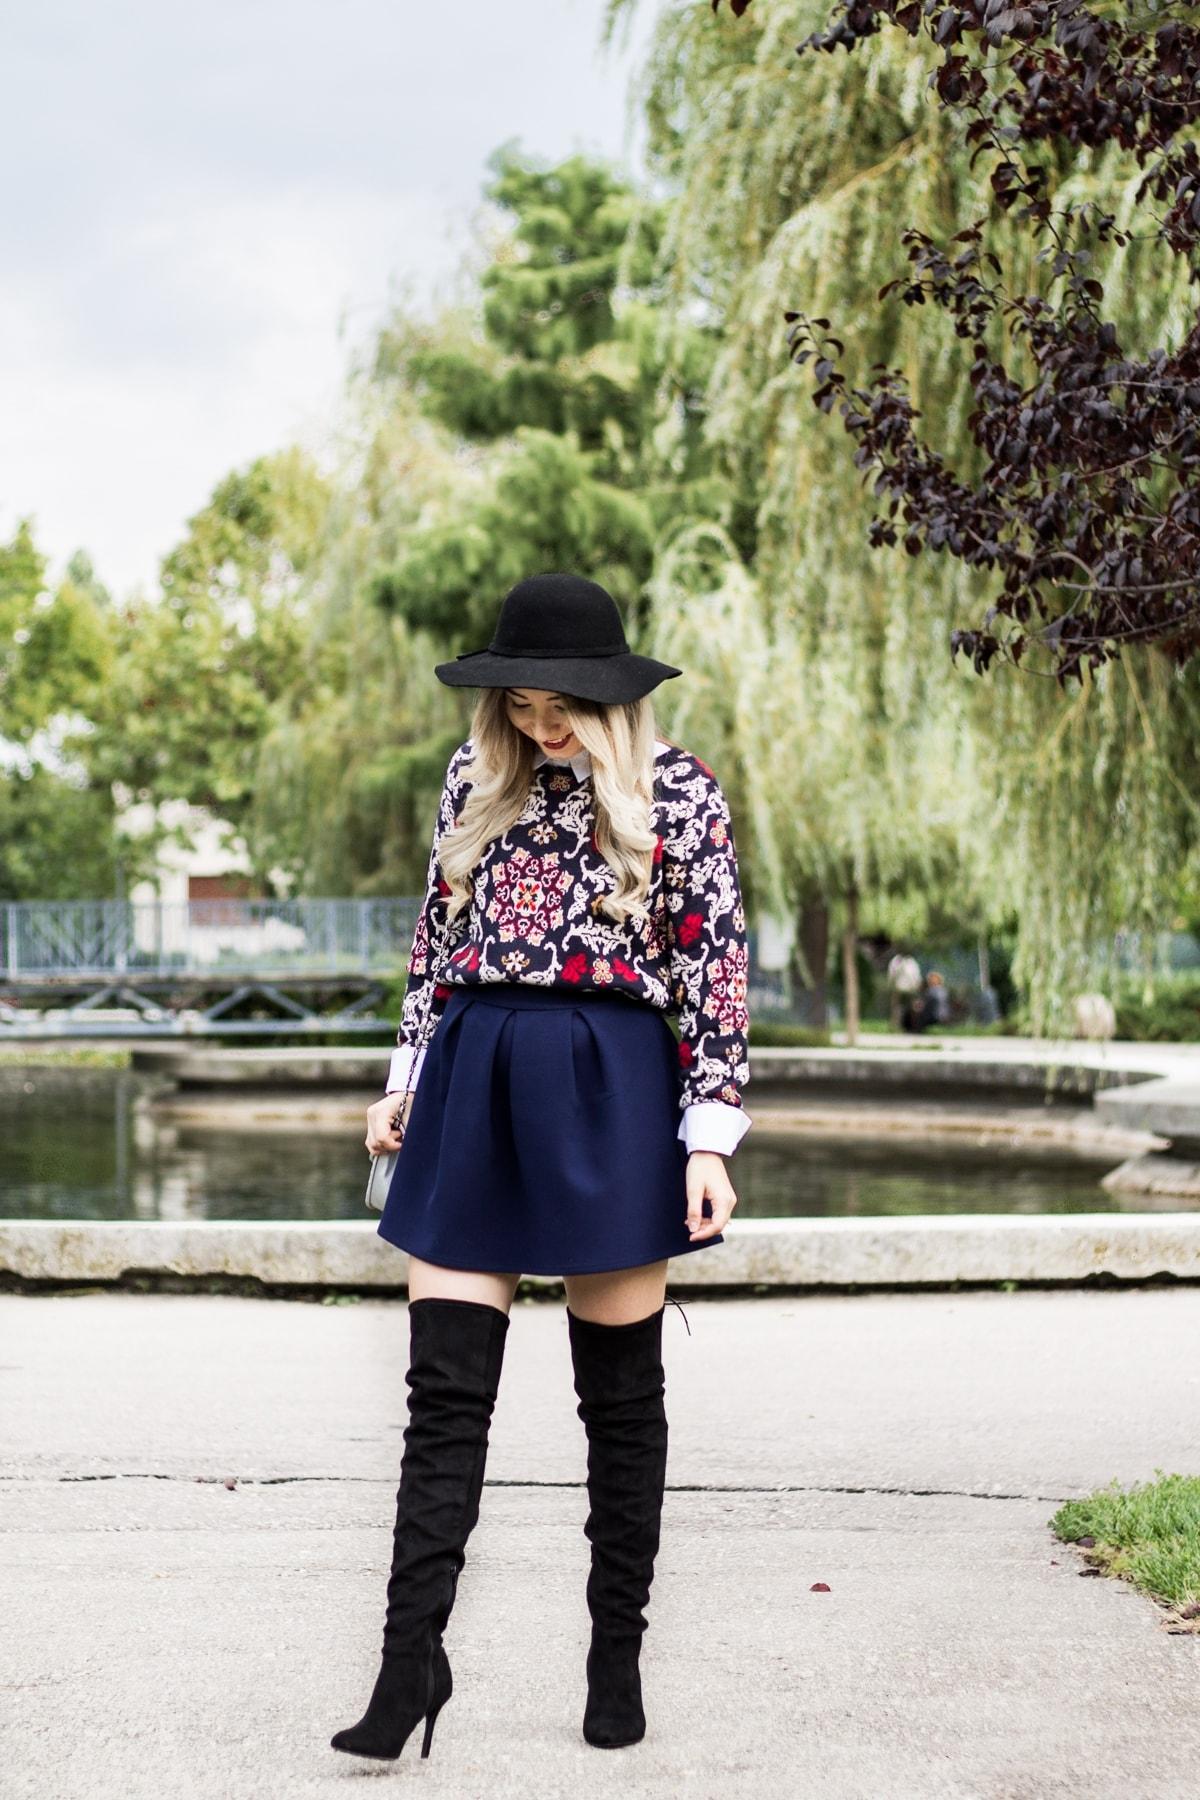 Andreea Ristea - street style, tinuta toamna, cum purtam palariile si cizmele peste genunchi